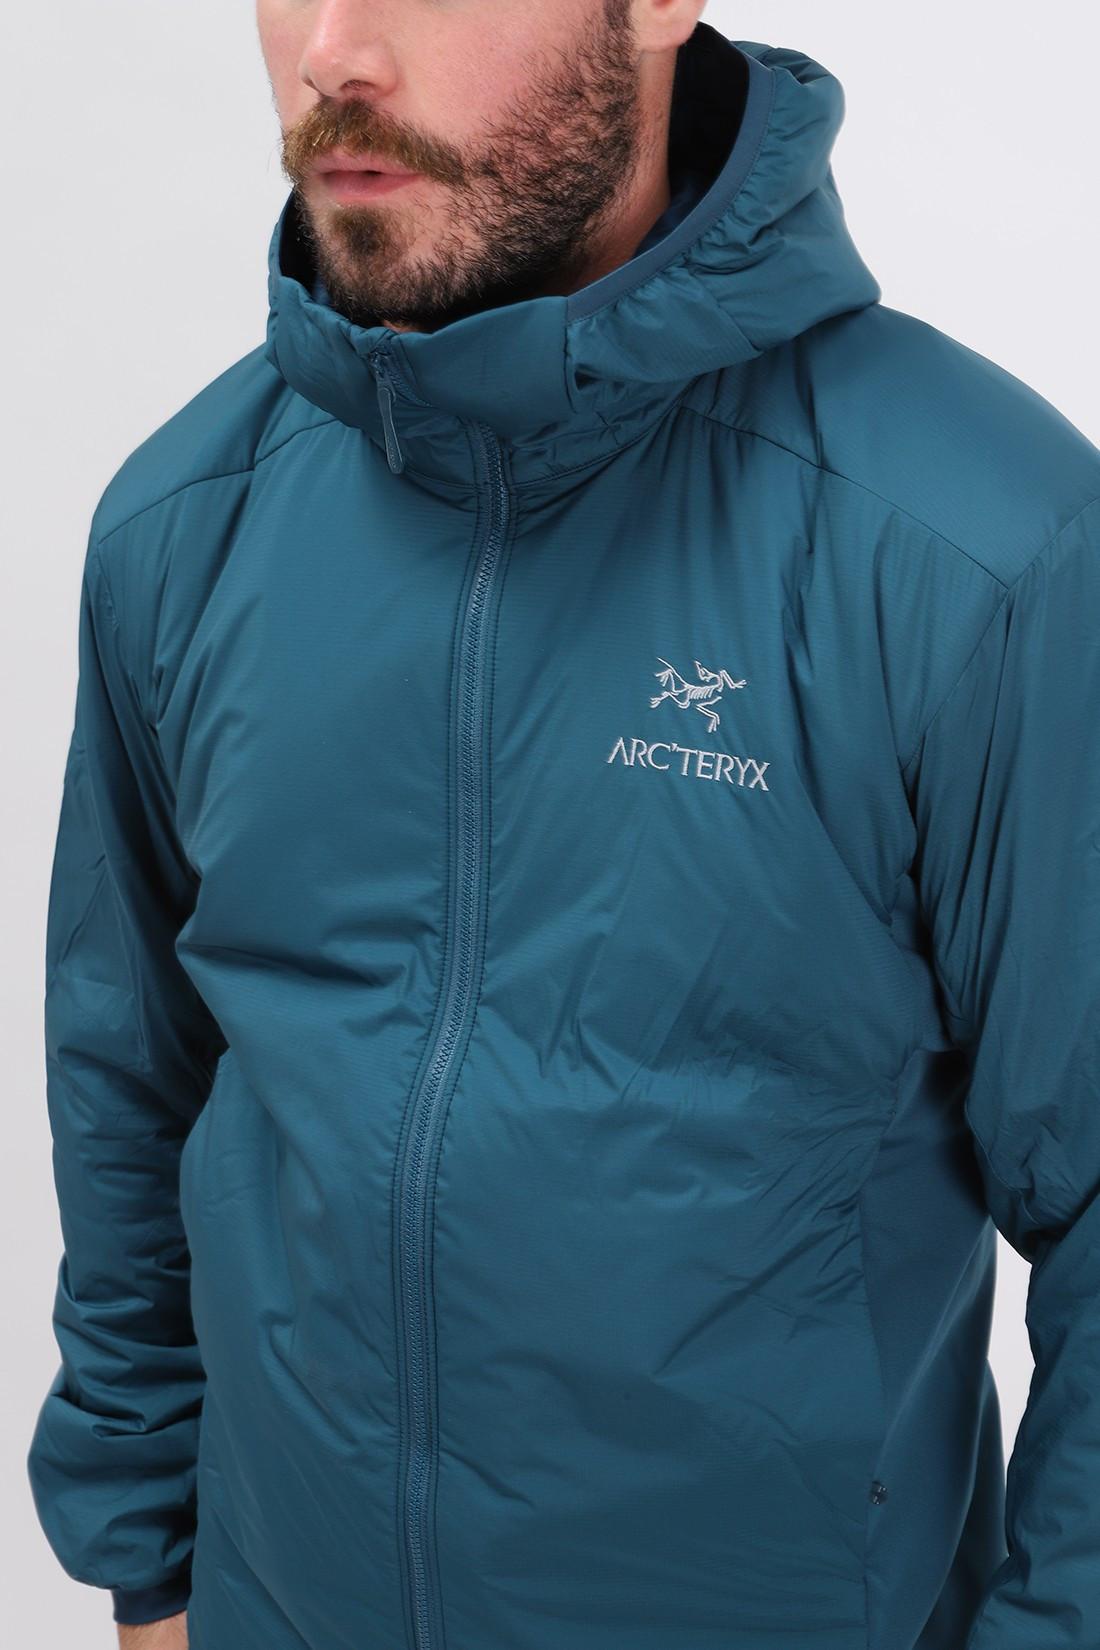 ARC'TERYX / Atom lt hoody mens jacket Timelapse